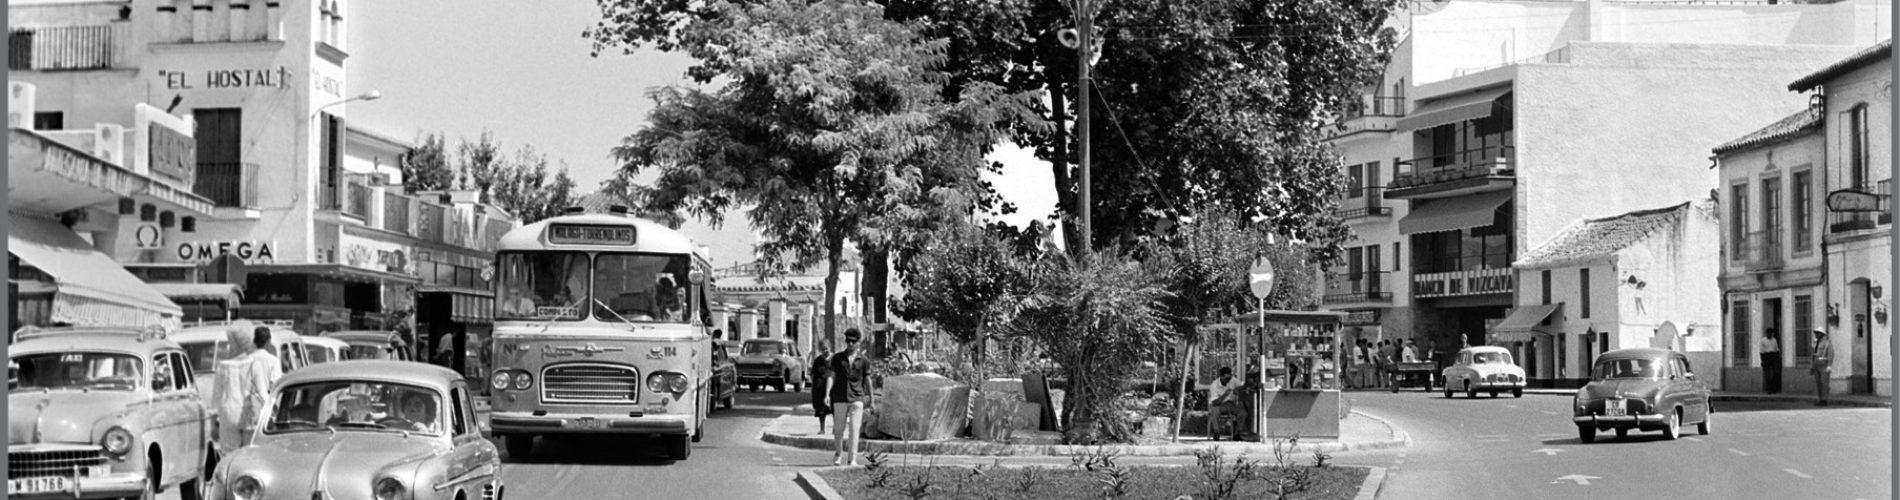 historia torremolinos 1963